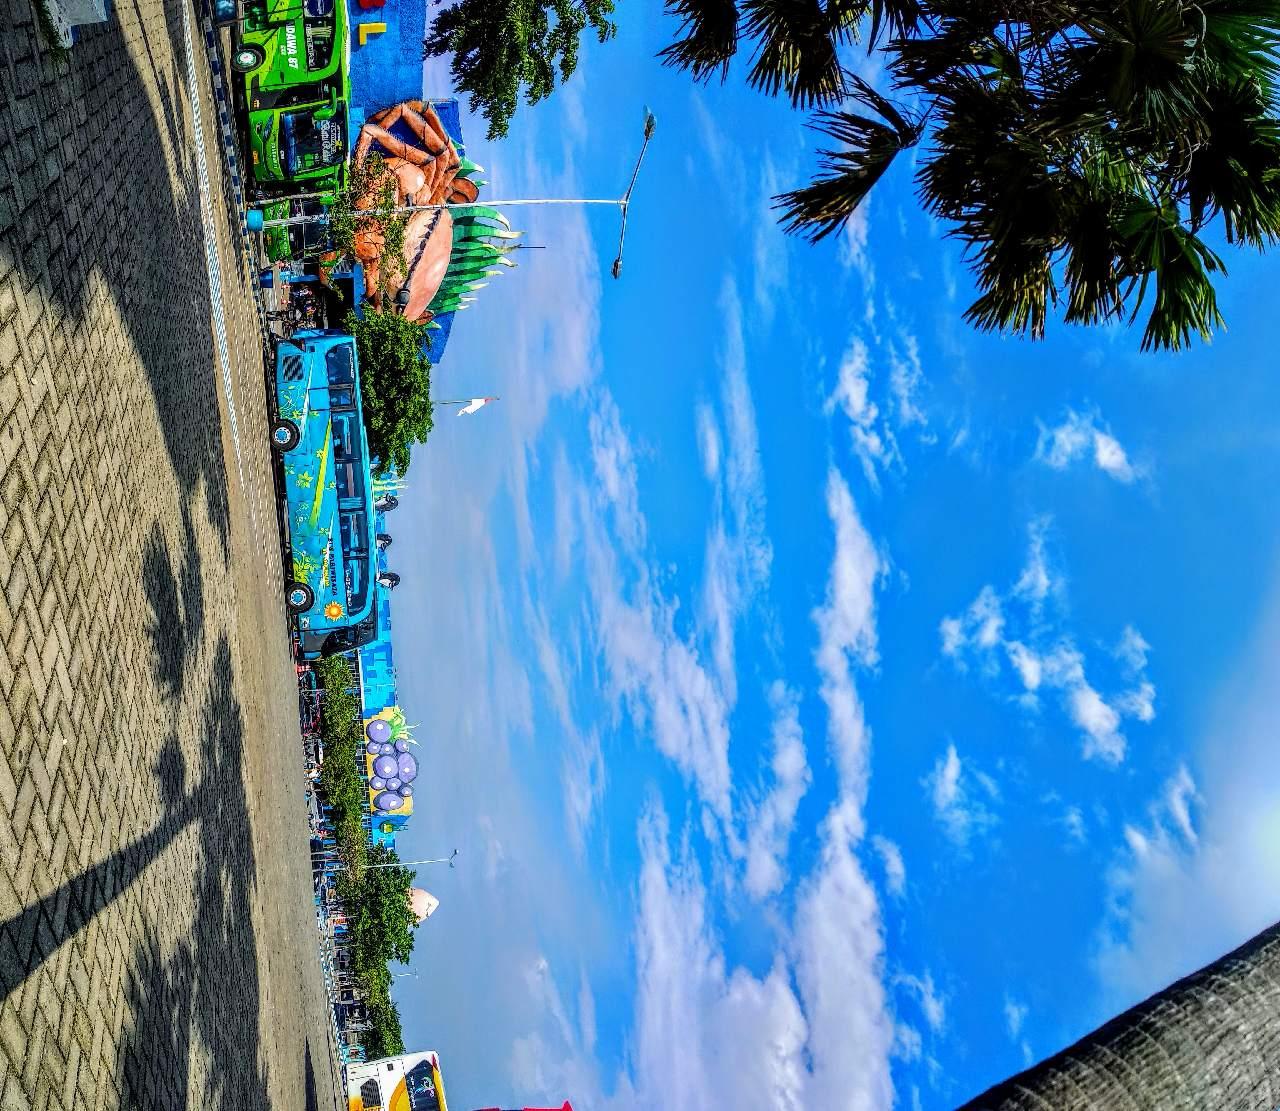 Wbl Wisata Bahari Lamongan Shot On Mi A1 Fotografi